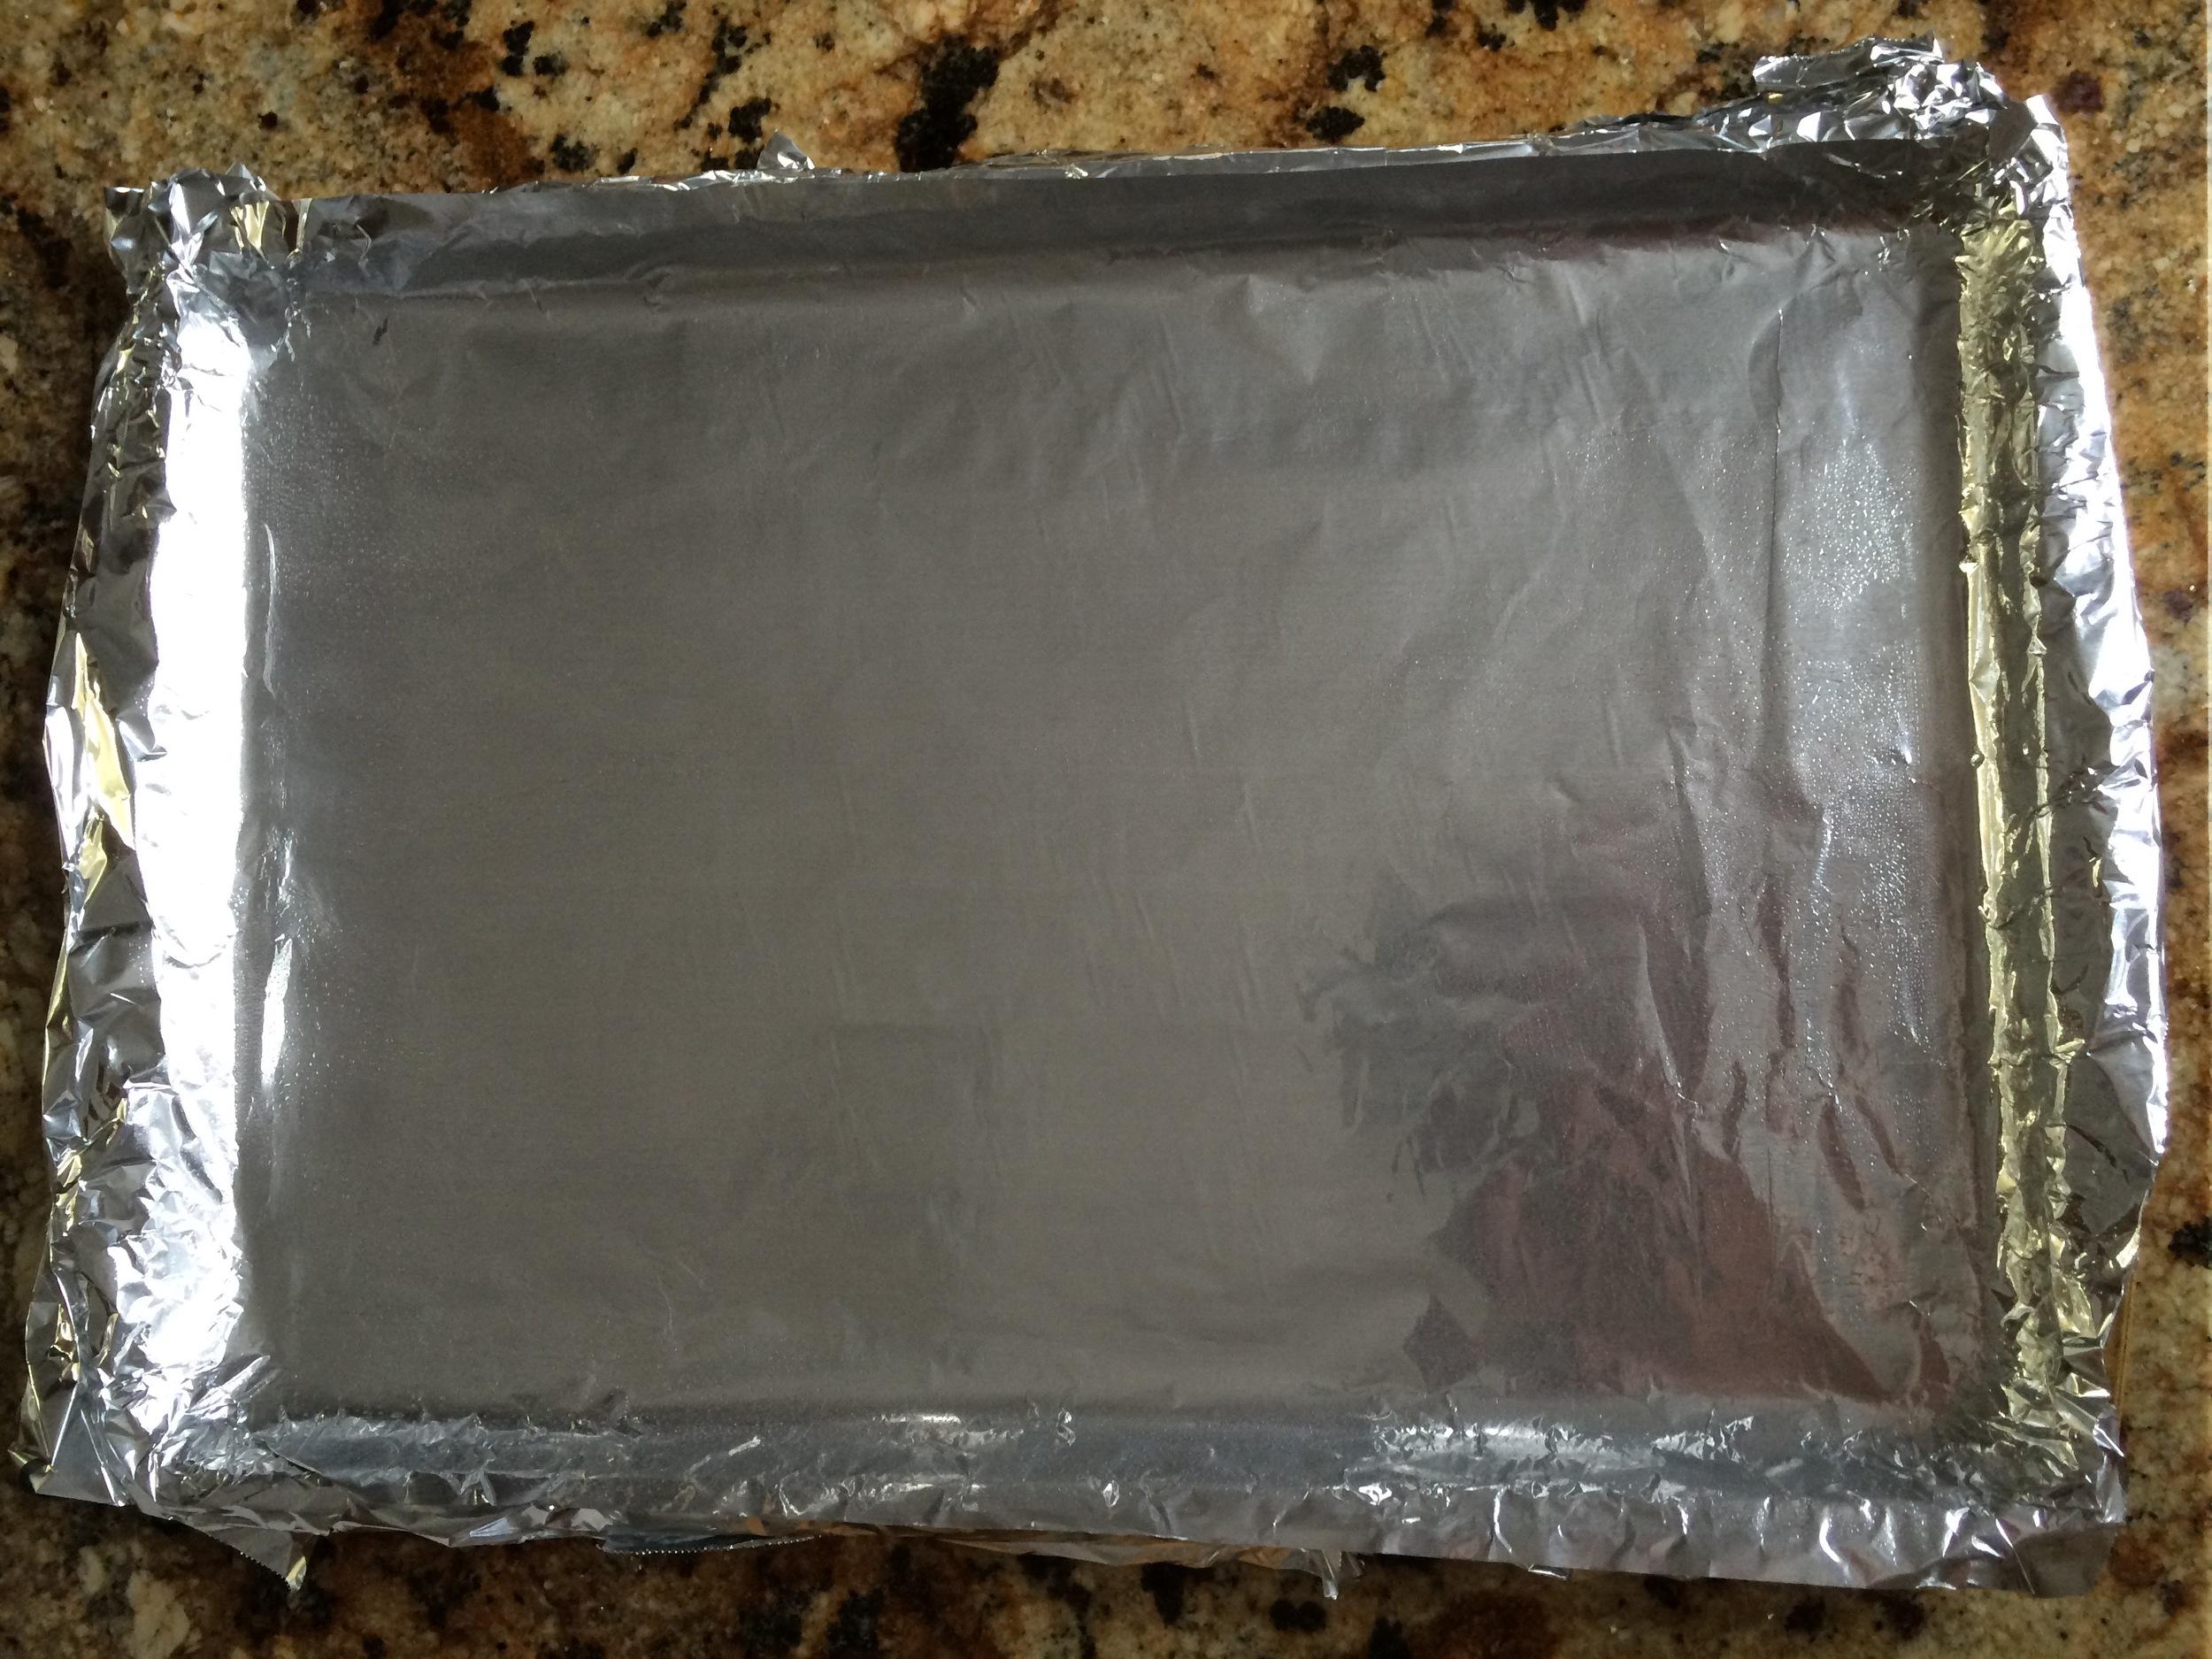 Foil sling greased